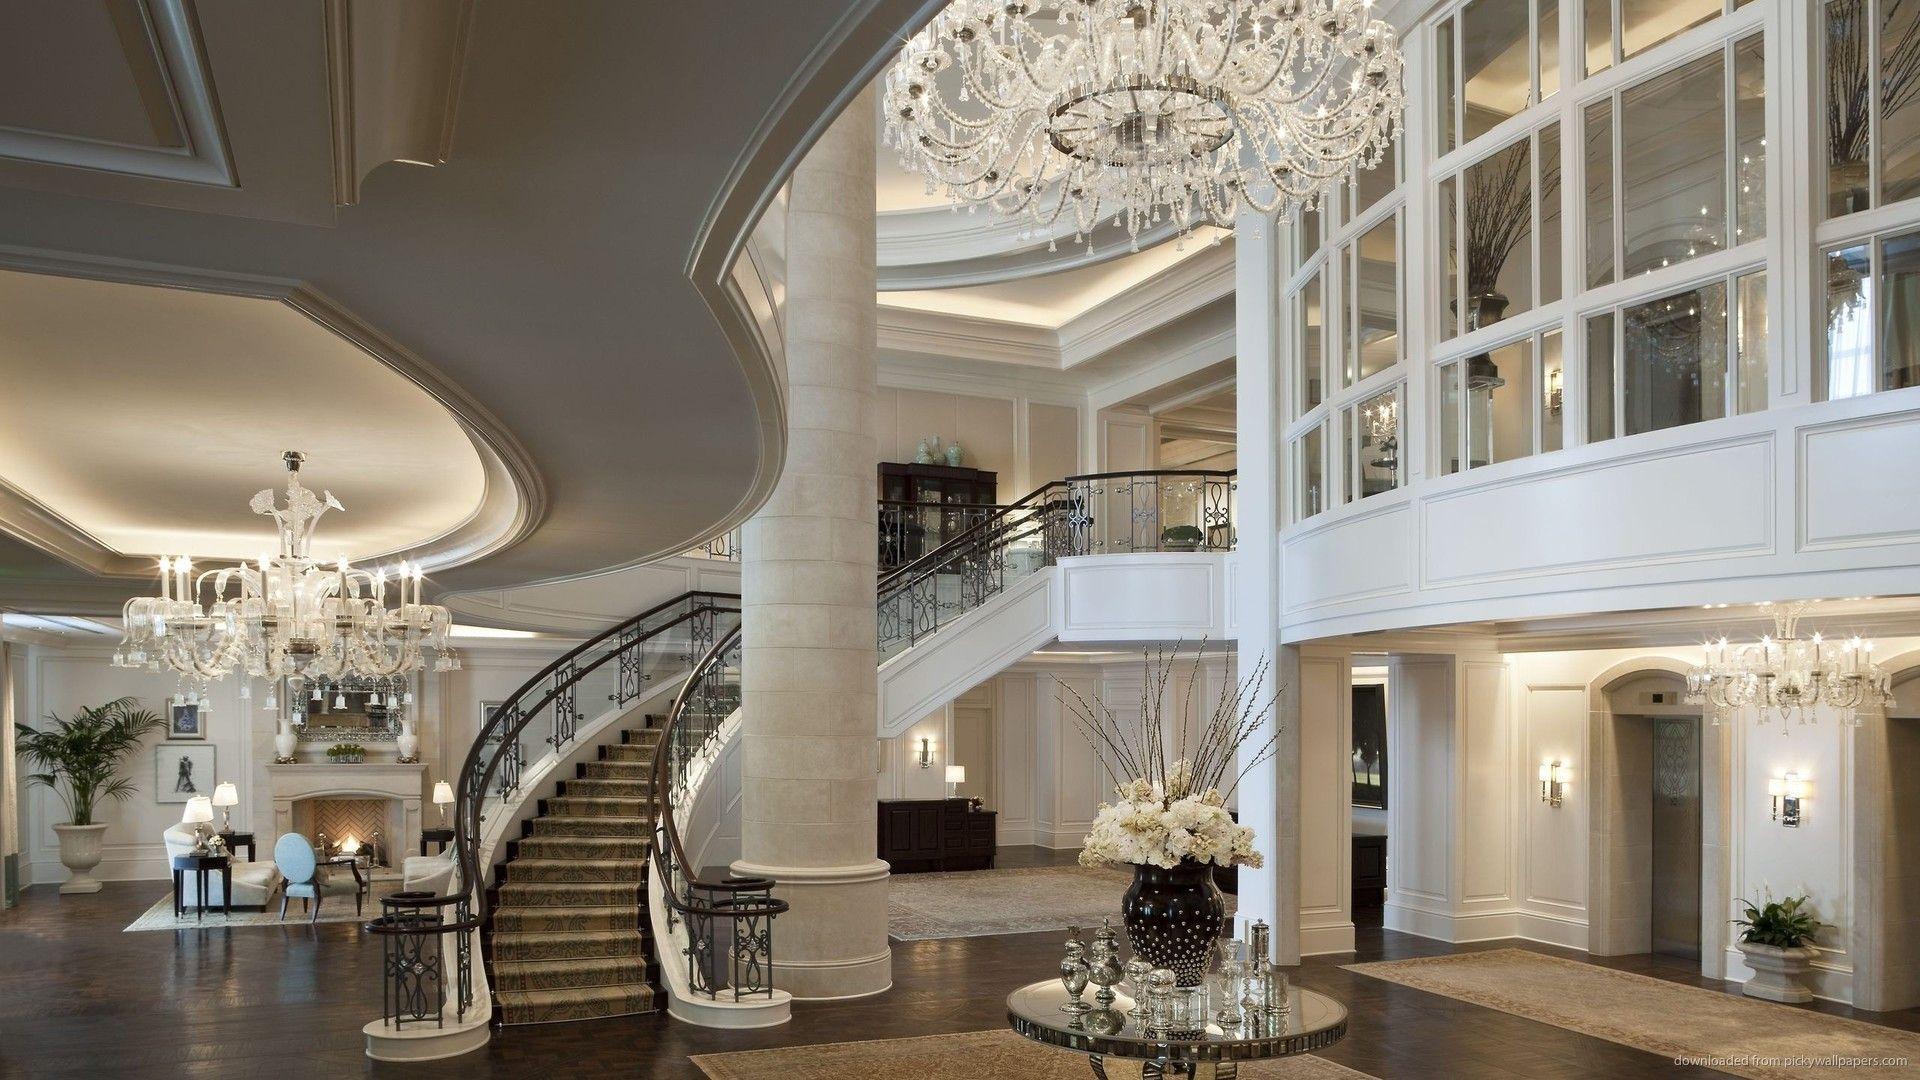 Interni Case Di Lusso Foto luxuryhomes | rosamaria g frangini || luxury interior, white